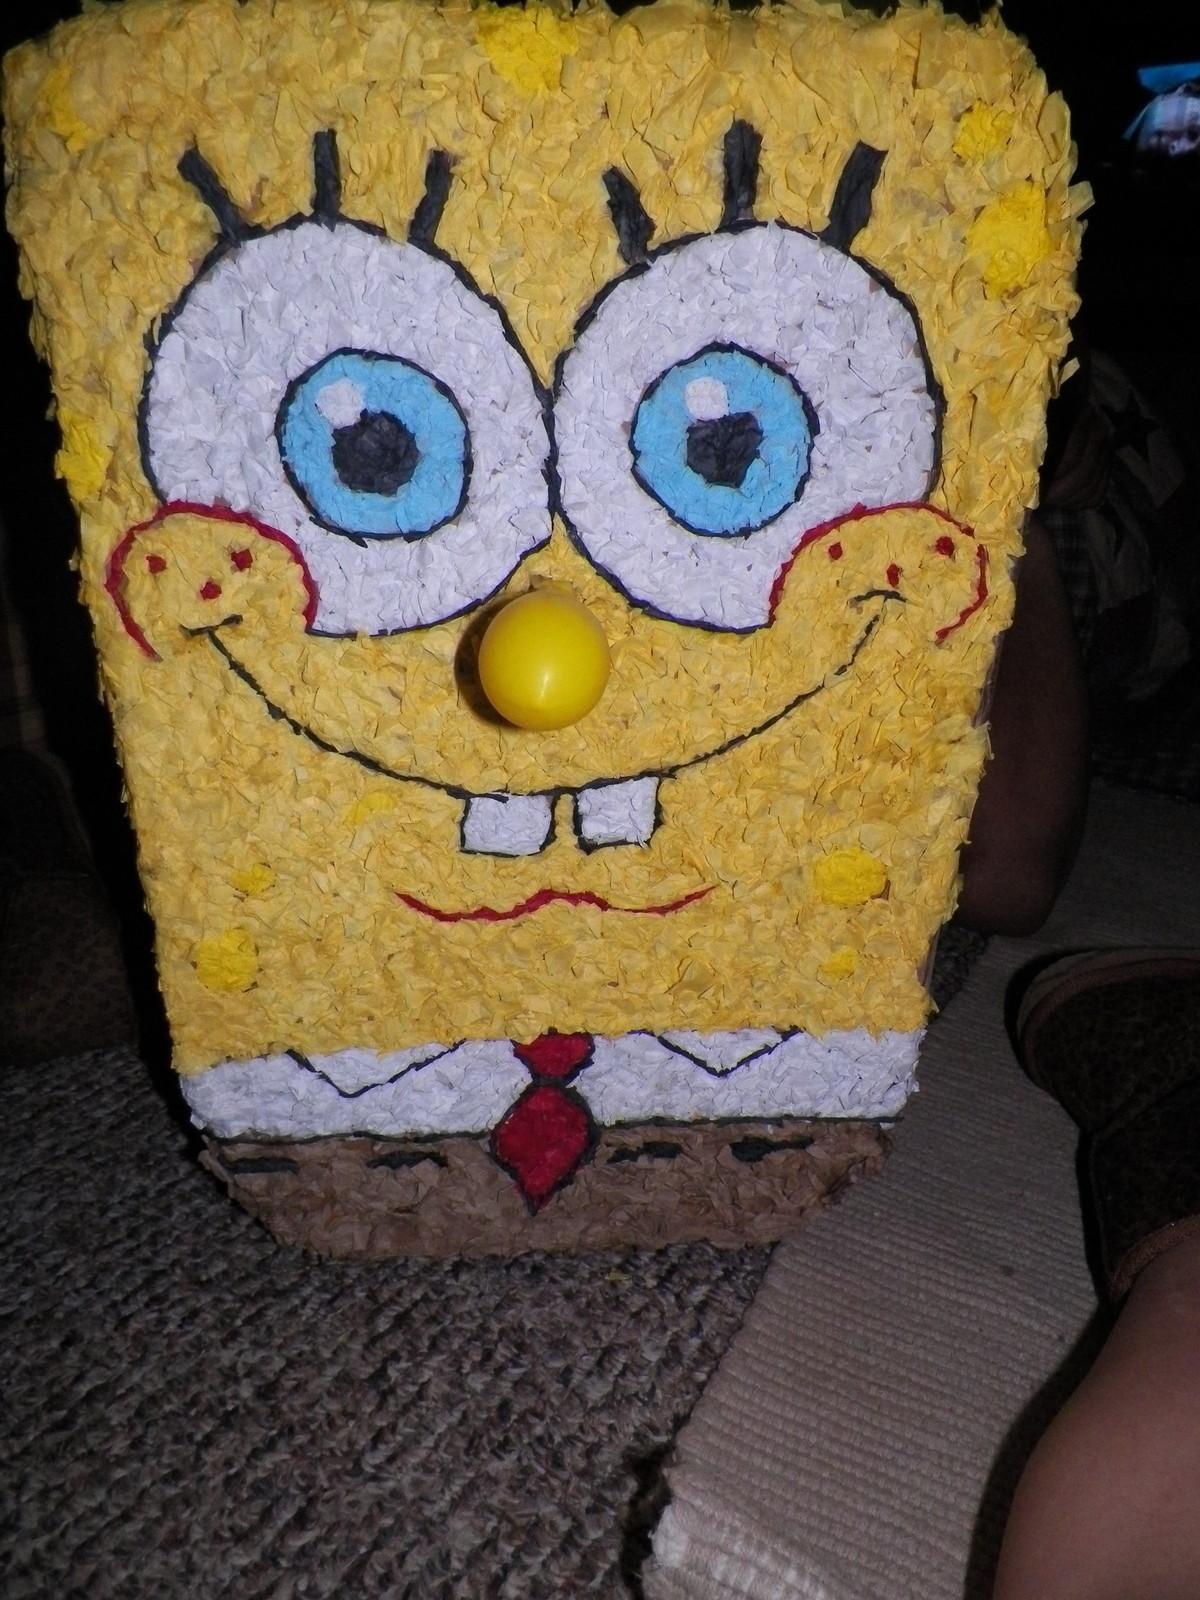 Spongebob Pinata 183 A Pi 241 Ata 183 Construction And Papercraft